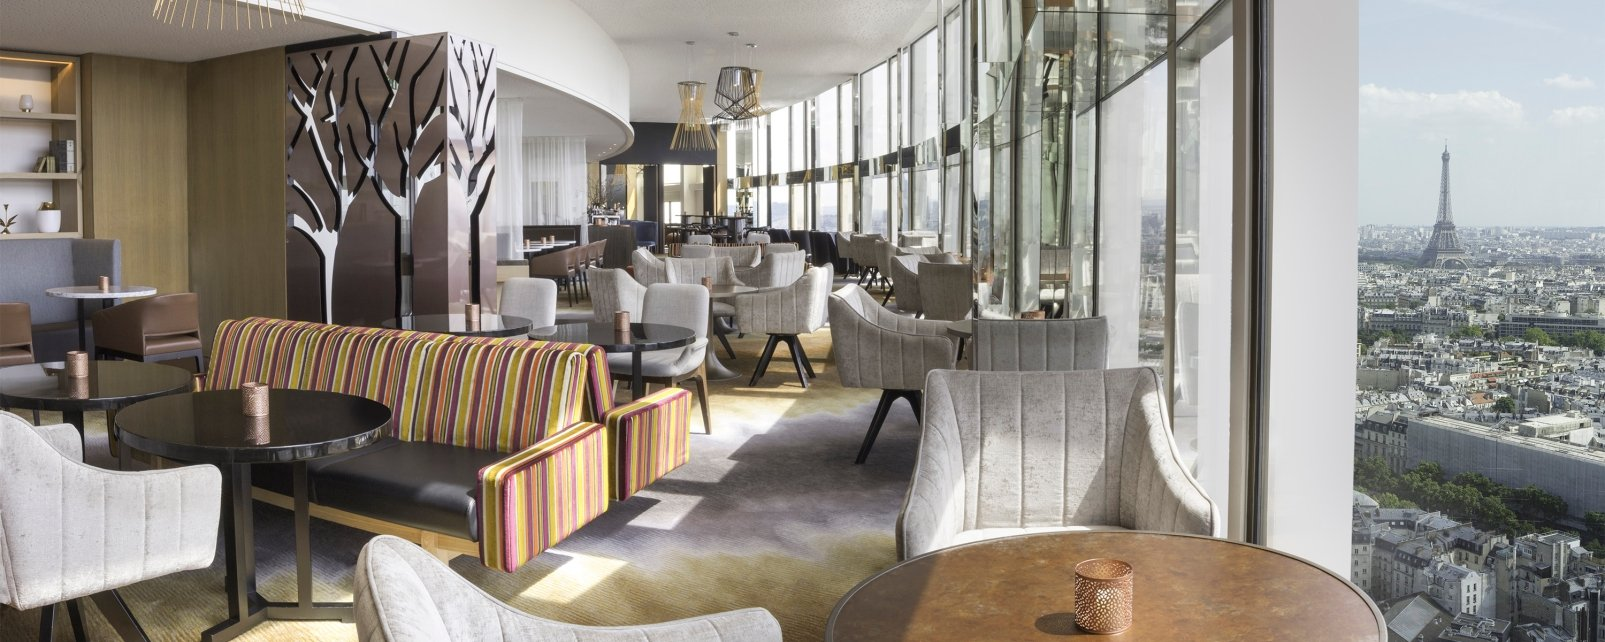 Hotel Regency Paris Etoile